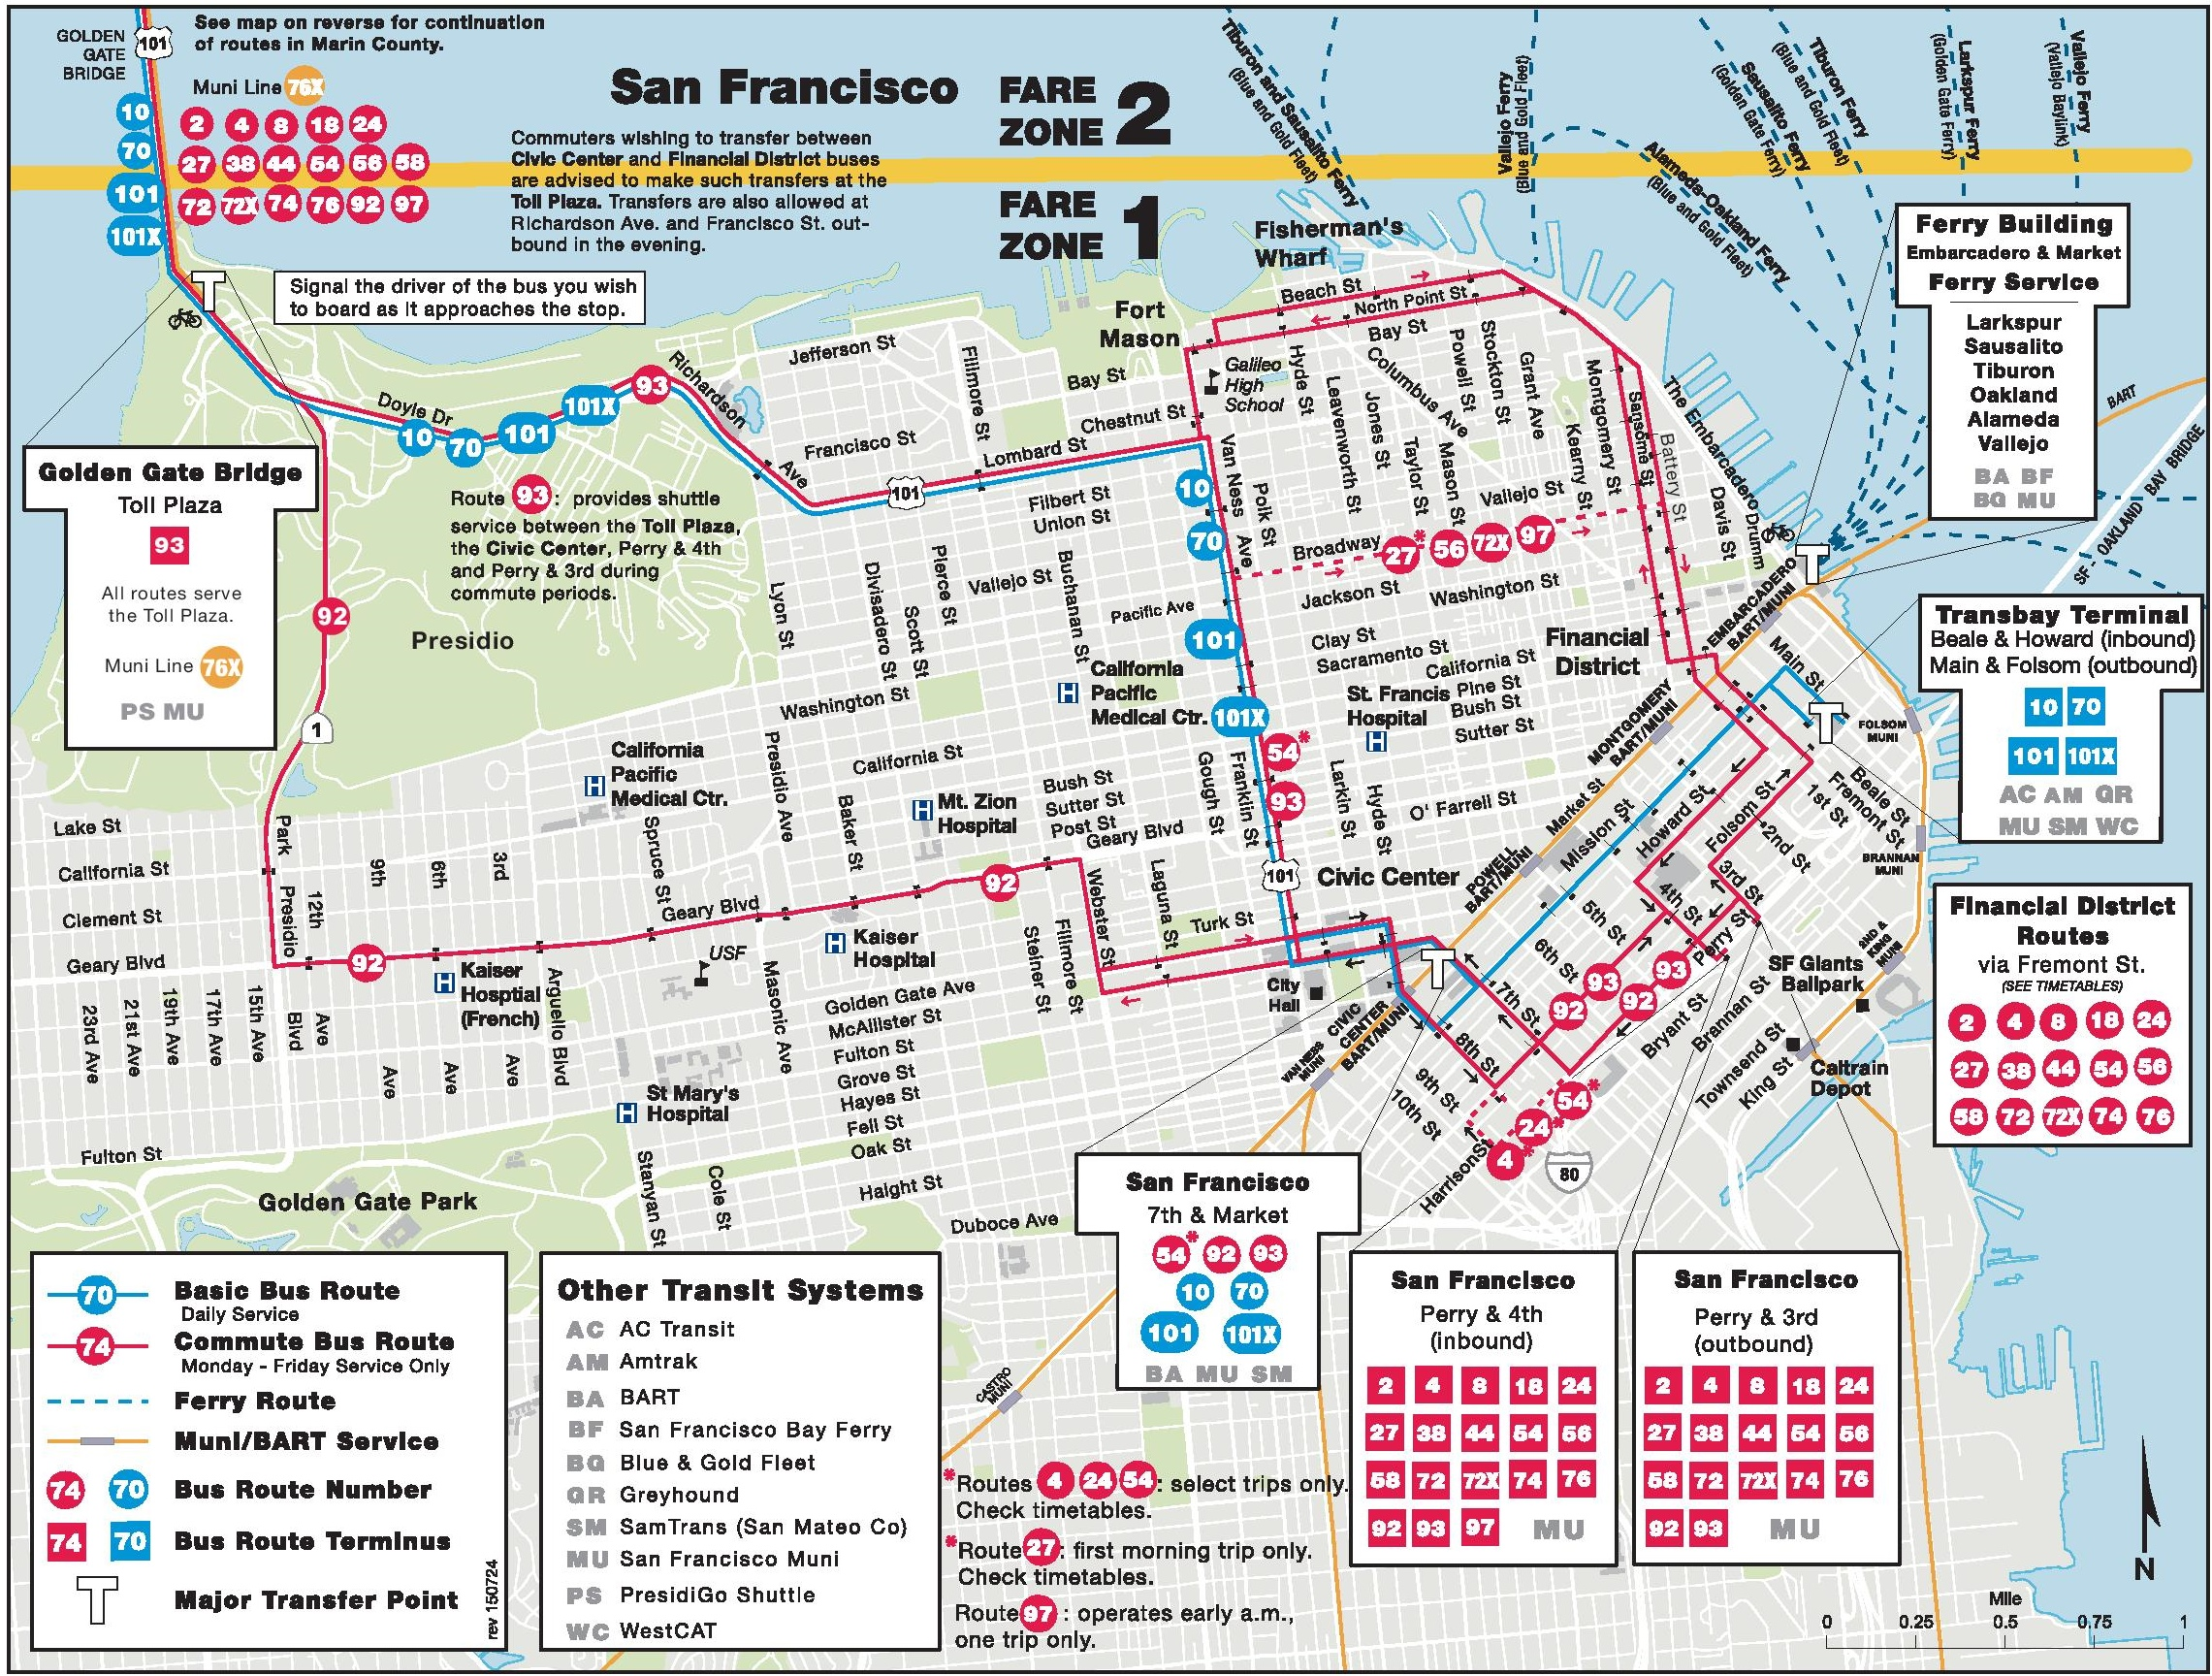 San Francisco bus map on edinburgh city bus map, cork city bus map, ny city bus map, paris city bus map, santa fe city bus map, detroit city bus map, lubbock city bus map, siena city bus map, london city bus map, mumbai city bus map, kyoto city bus map, seattle city bus map, sydney city bus map, belfast city bus map, santa barbara bus map, orange county bus map, sacramento bus map, austin city bus map, orlando city bus map, chicago city bus map,